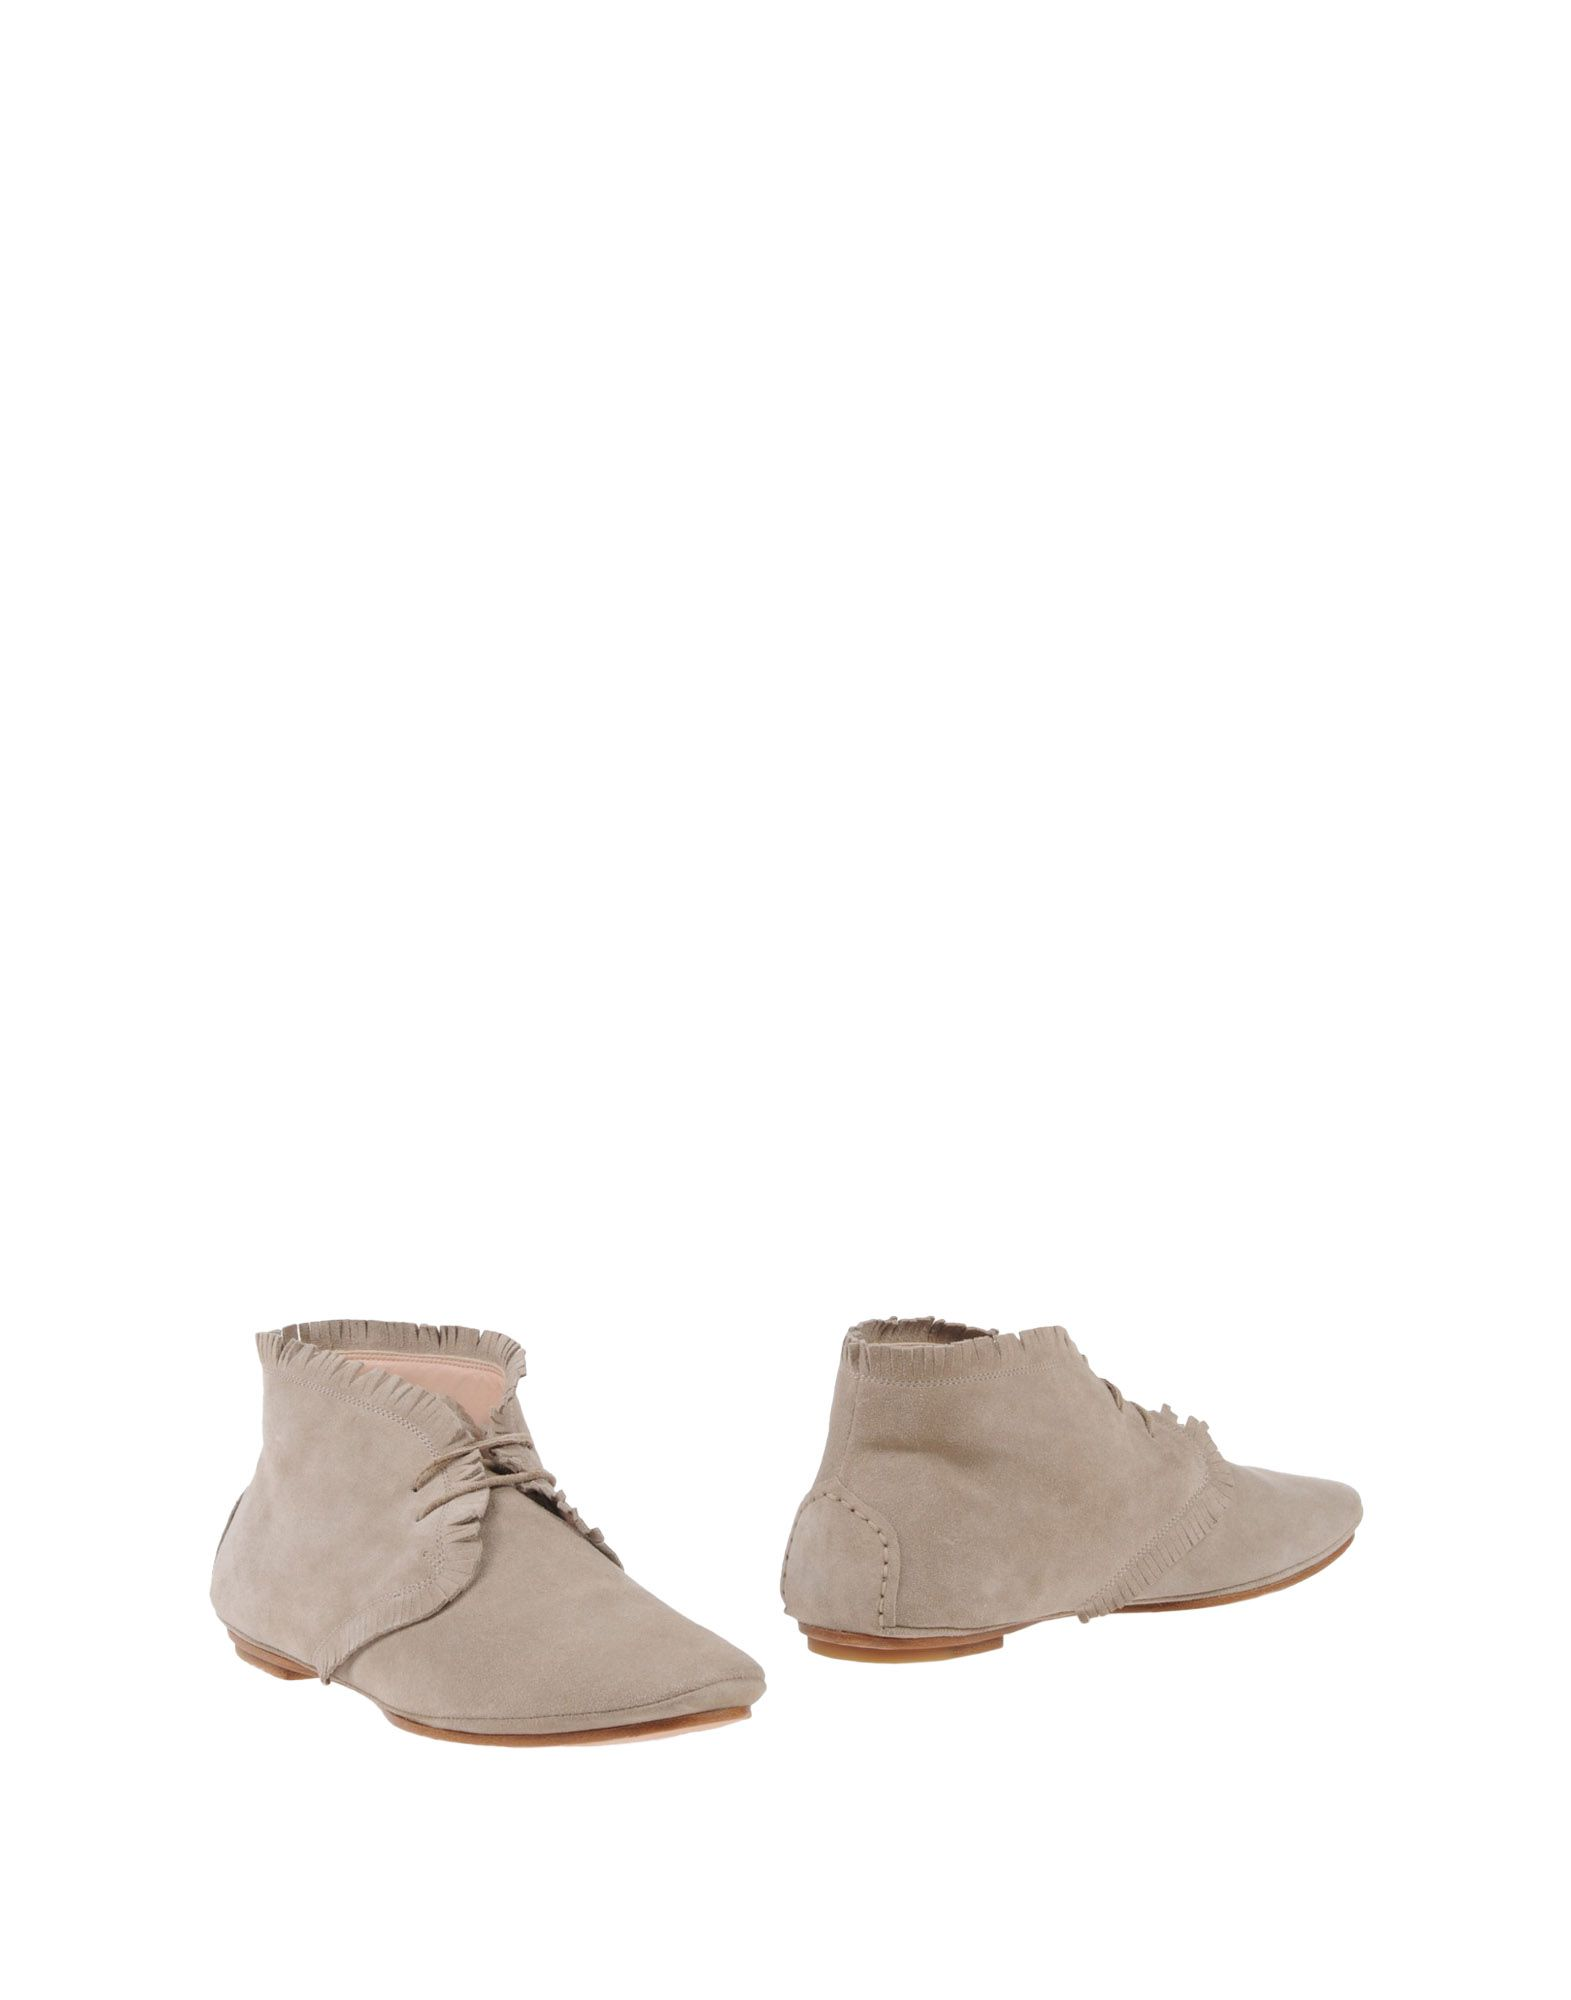 UNÜTZER Ankle Boot in Light Grey